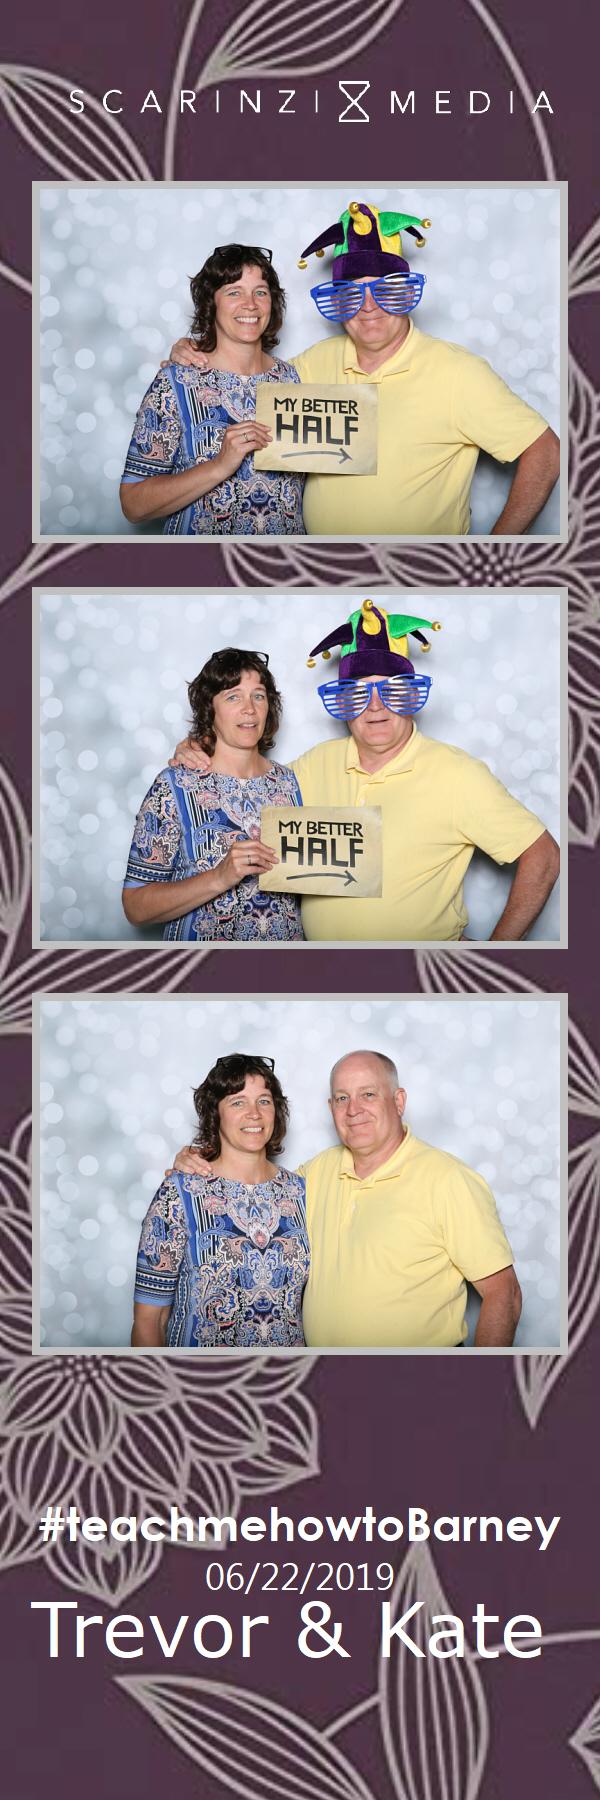 2019.06.22 - Barney Wedding PHOTOBOOTH10.jpg